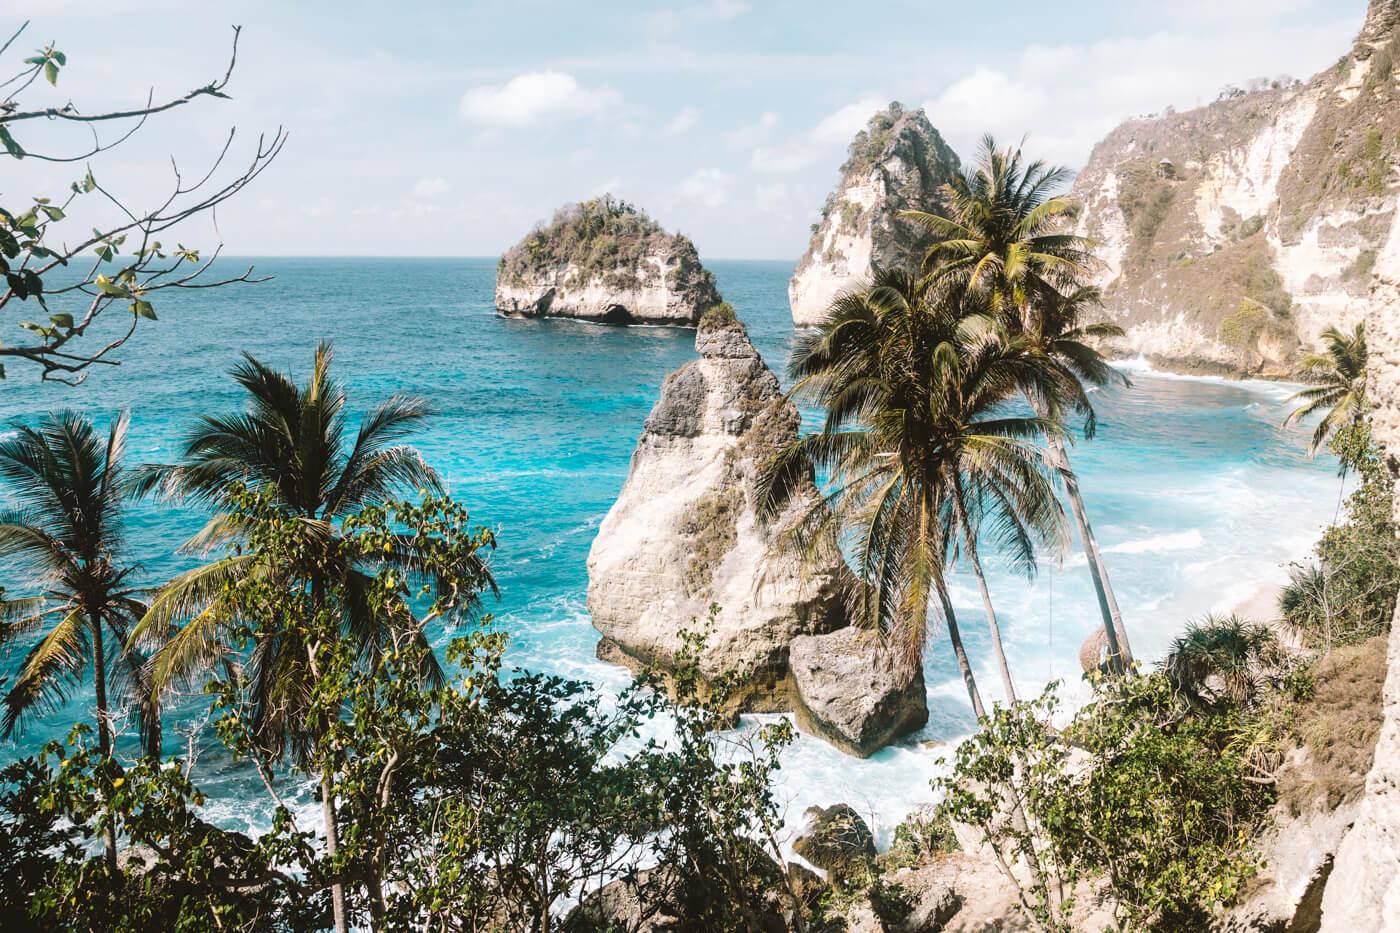 Roteiro Indonésia 3 semanas - Nusa Penida